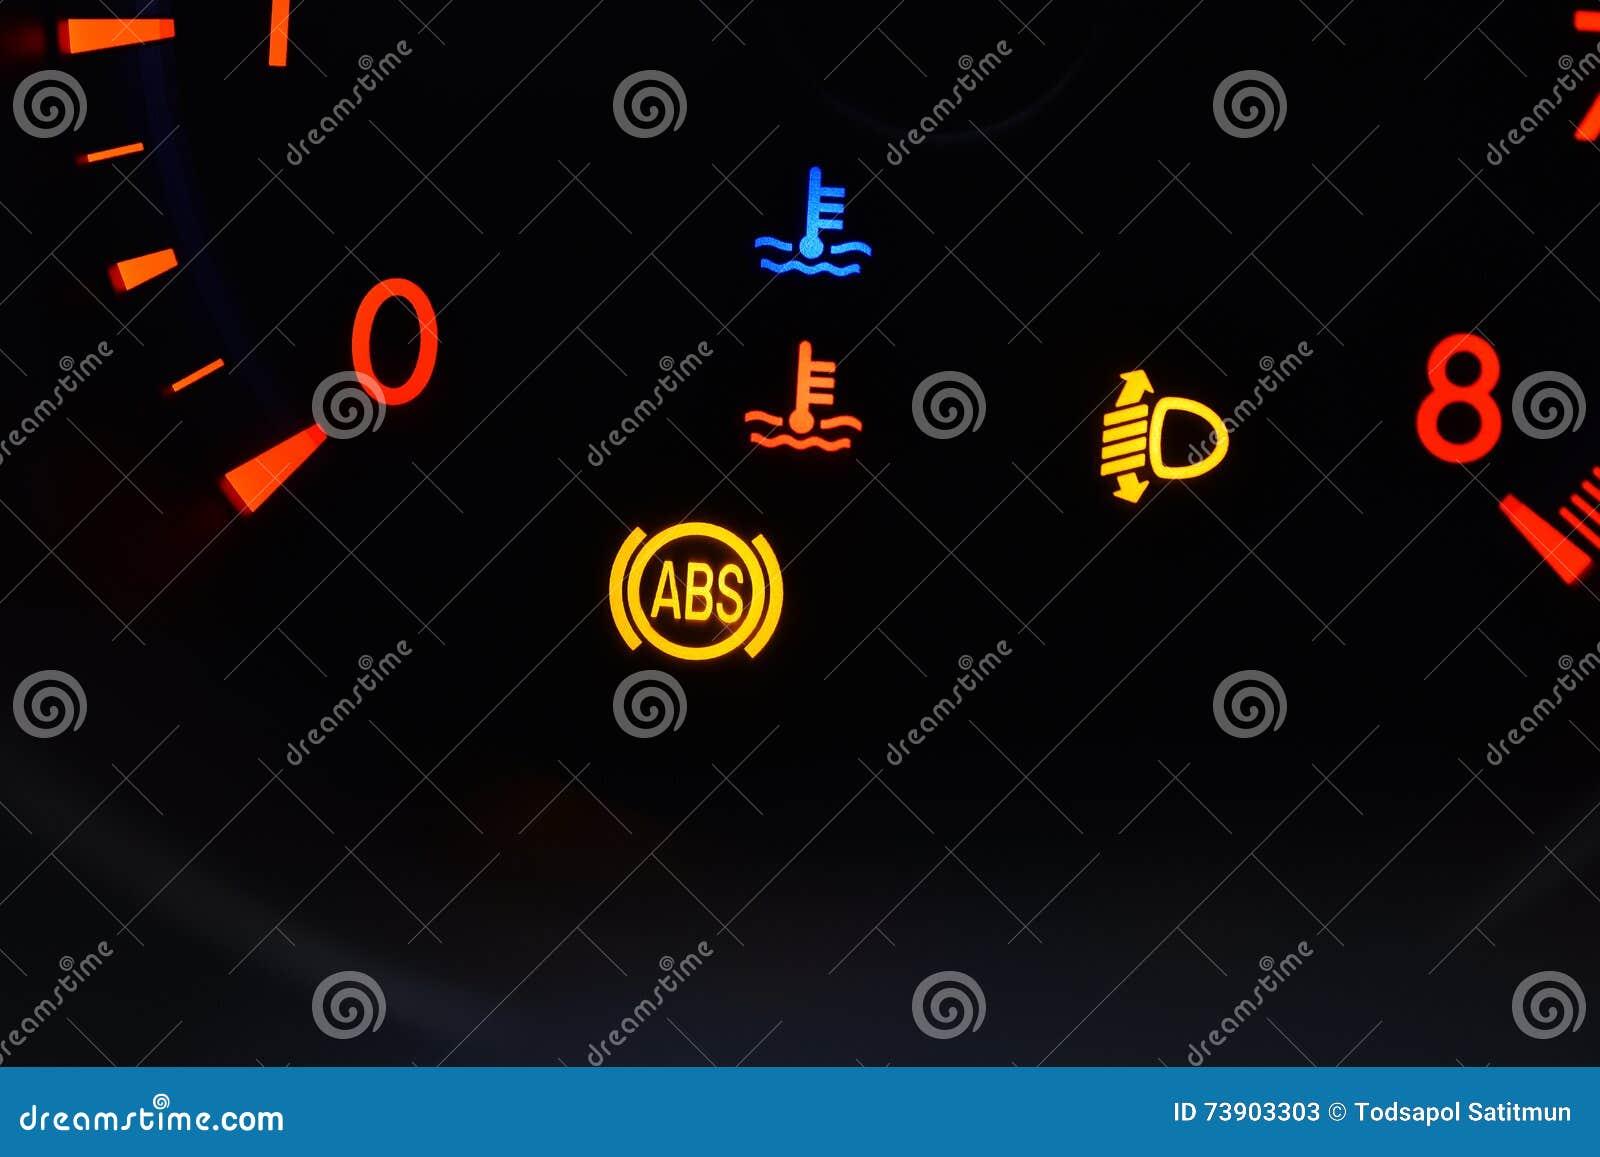 Speedometer In Car Stock Image Image Of Symbol Speedometer 73903303